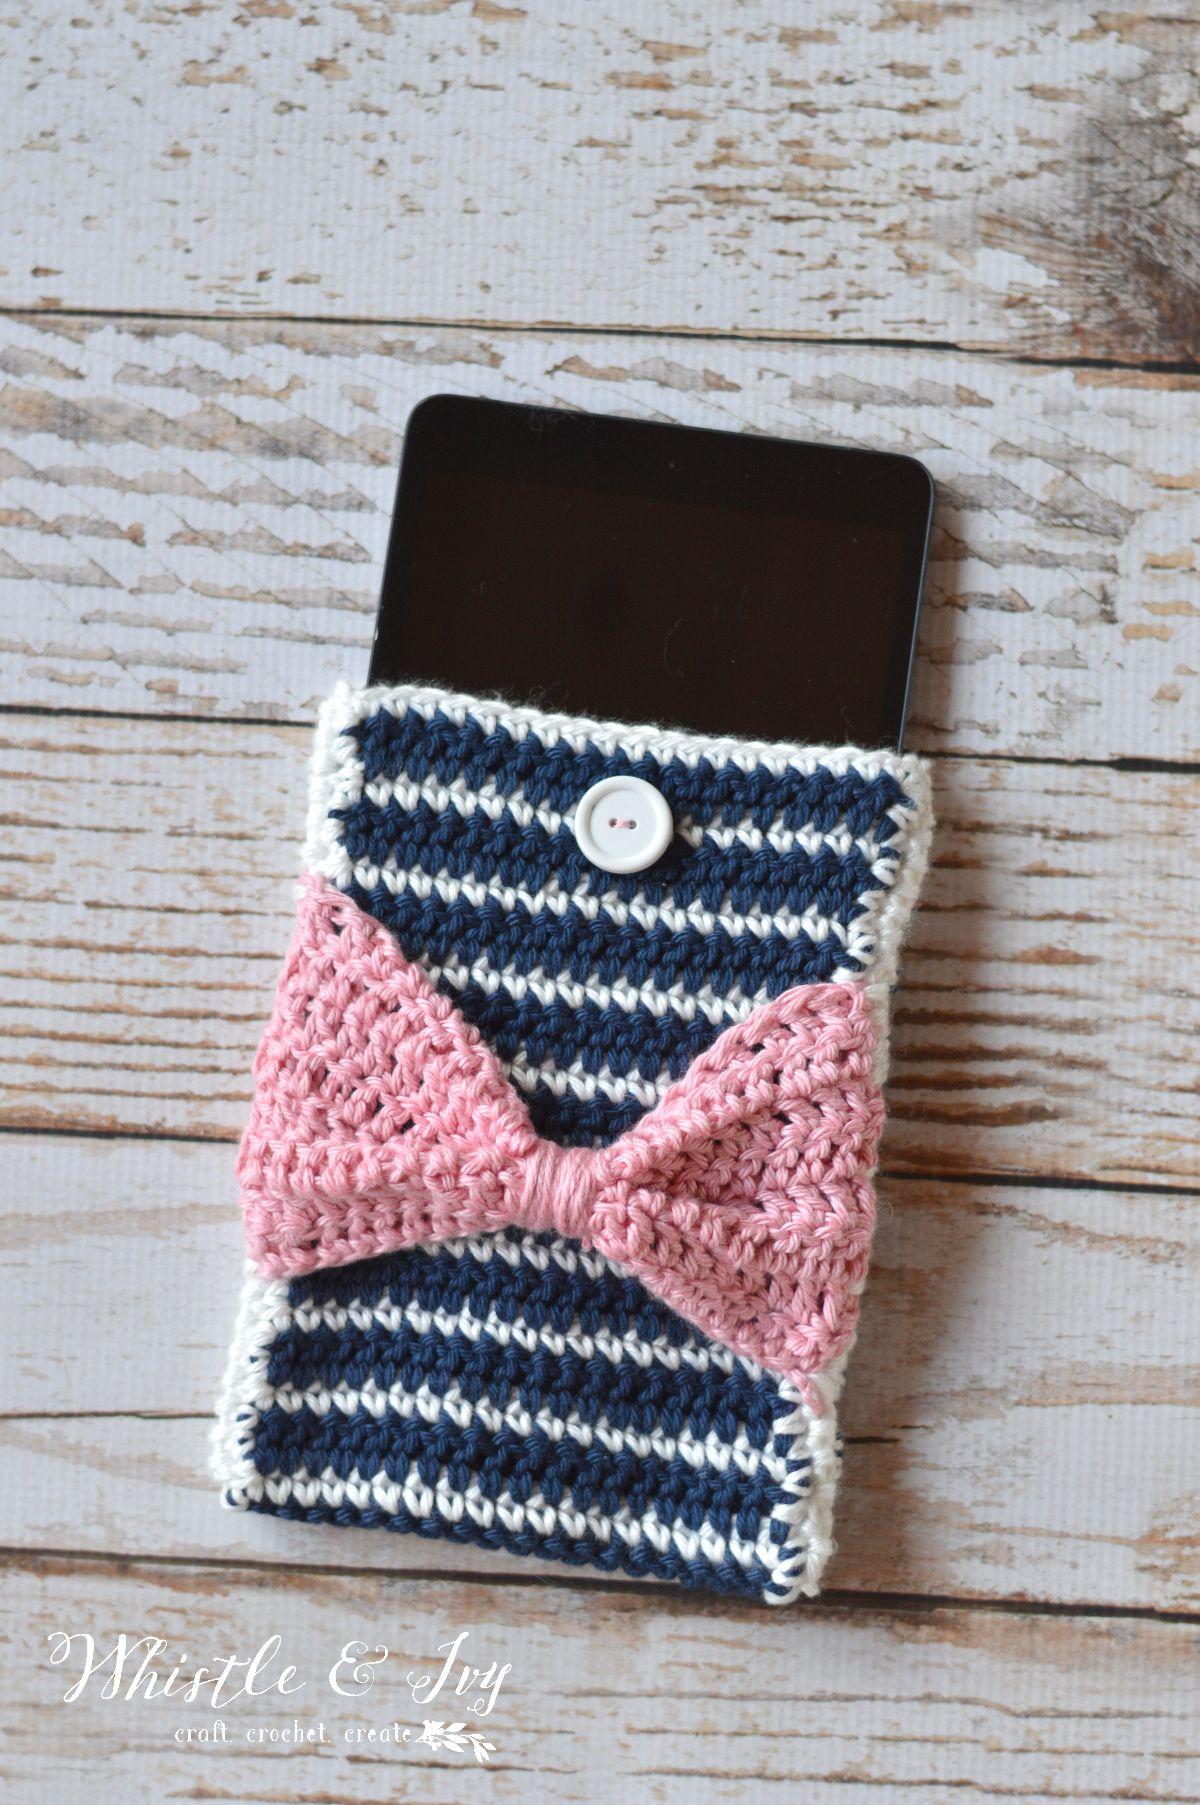 Fancy stripes device pouch free pattern the ojays and customize free crochet pattern fancy stripes device pouch customize this fun pattern for any device bankloansurffo Gallery